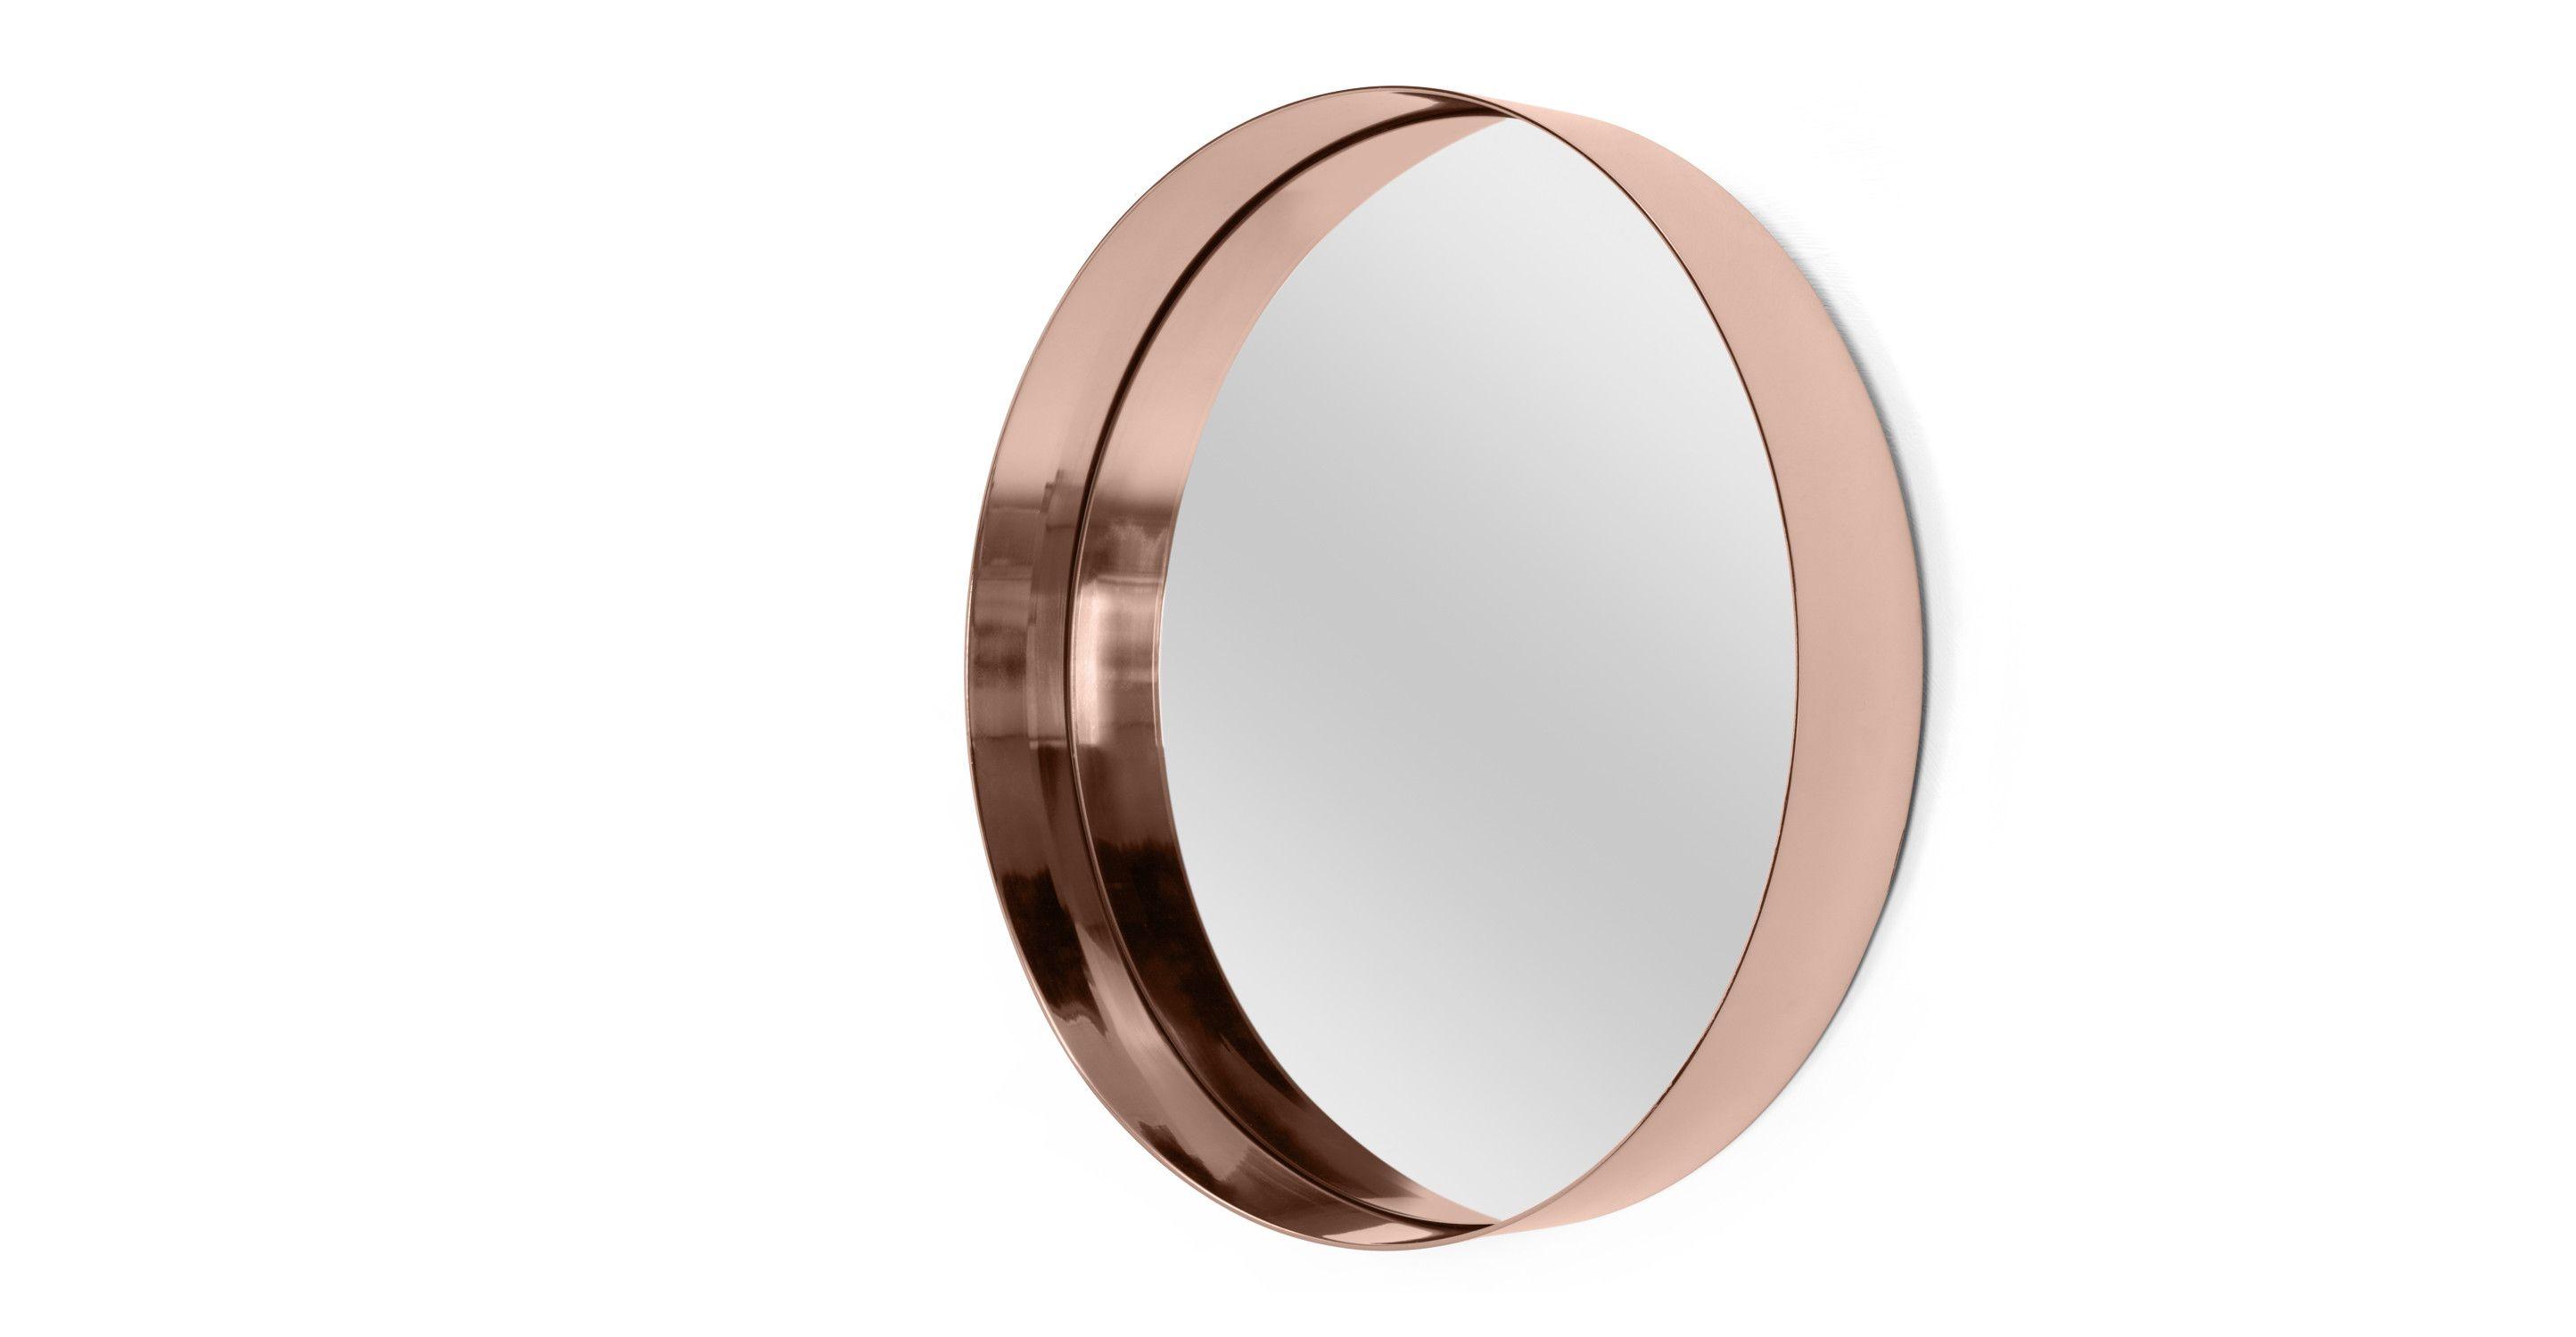 Grote Ronde Spiegel : Grote ronde spiegel fabulous grote moderne kaptafel van grijs